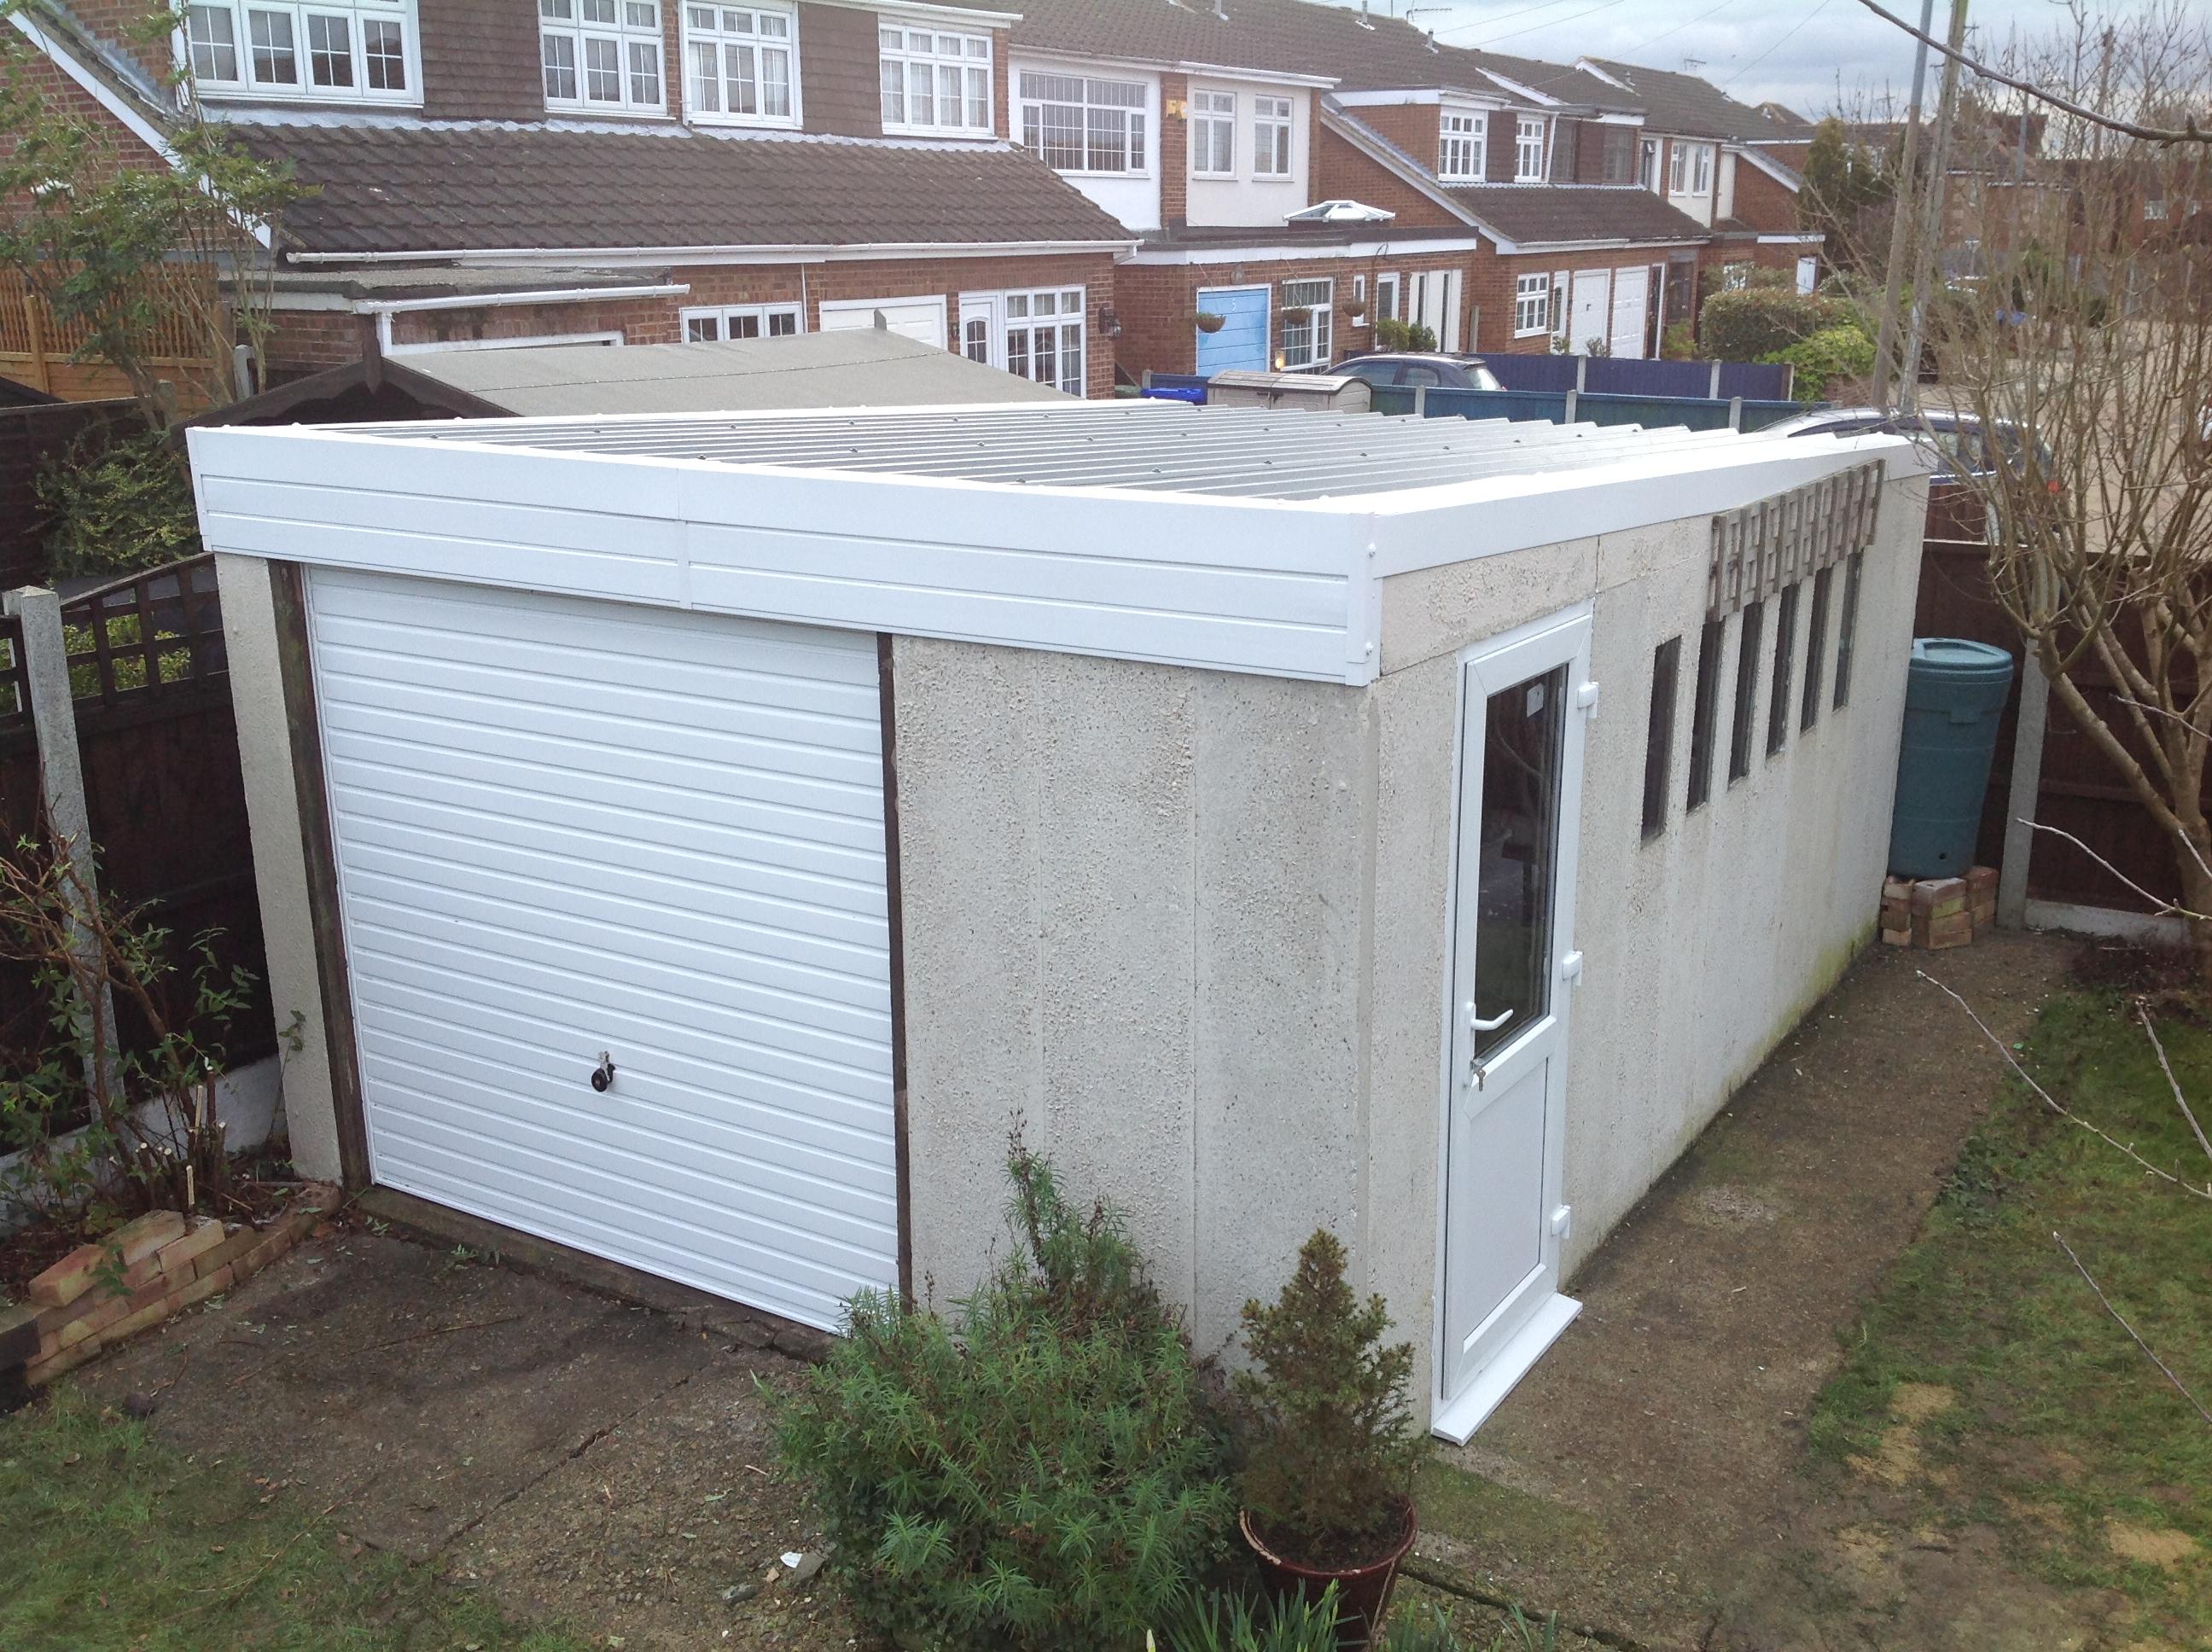 14 Pent Style Garage Essex Garageroofs Co Uk